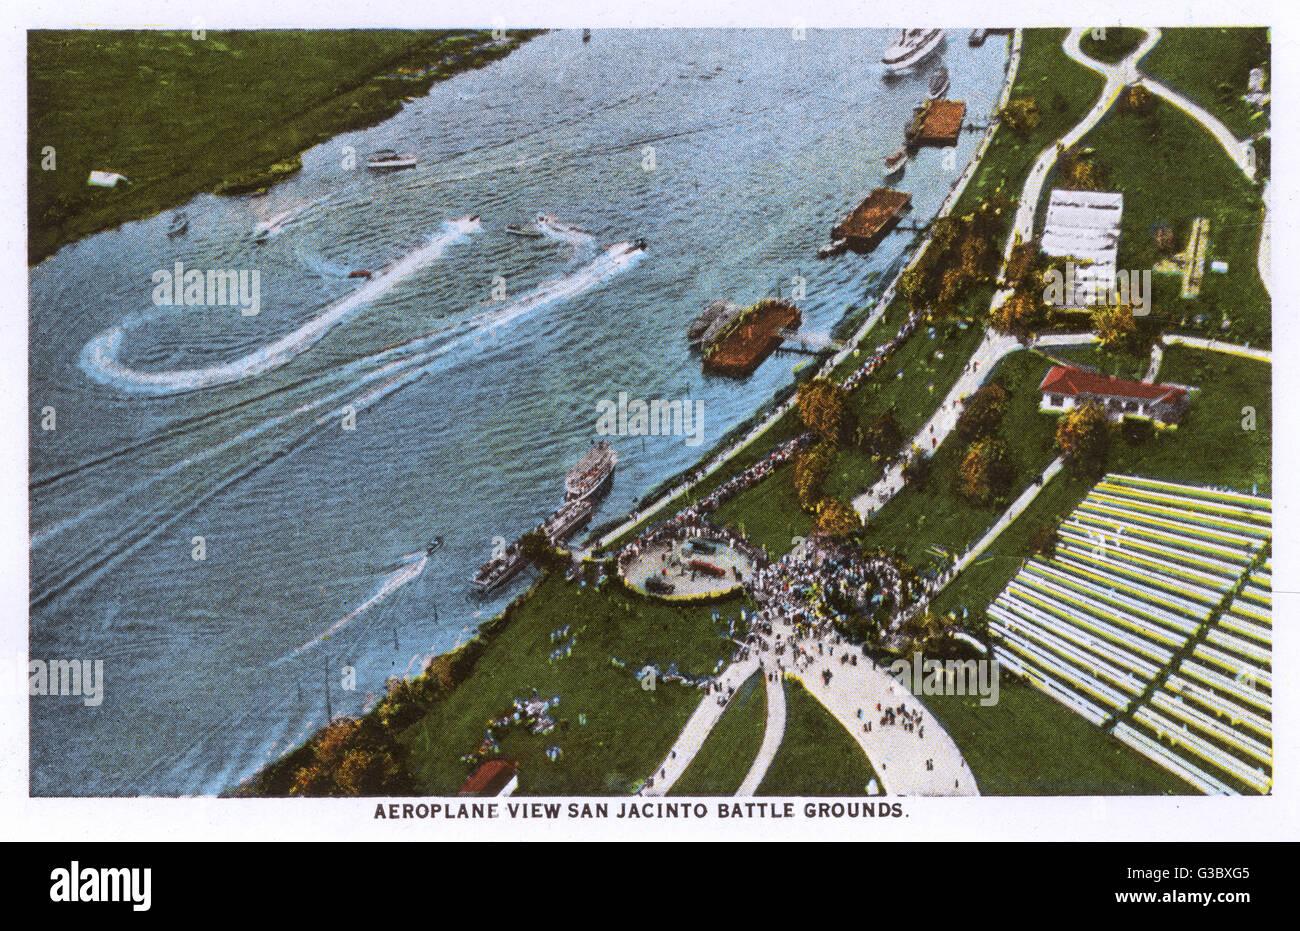 Aerial view, taken from an aeroplane, of the San Jacinto Battleground historic site, Houston, Texas, USA.  The battle - Stock Image